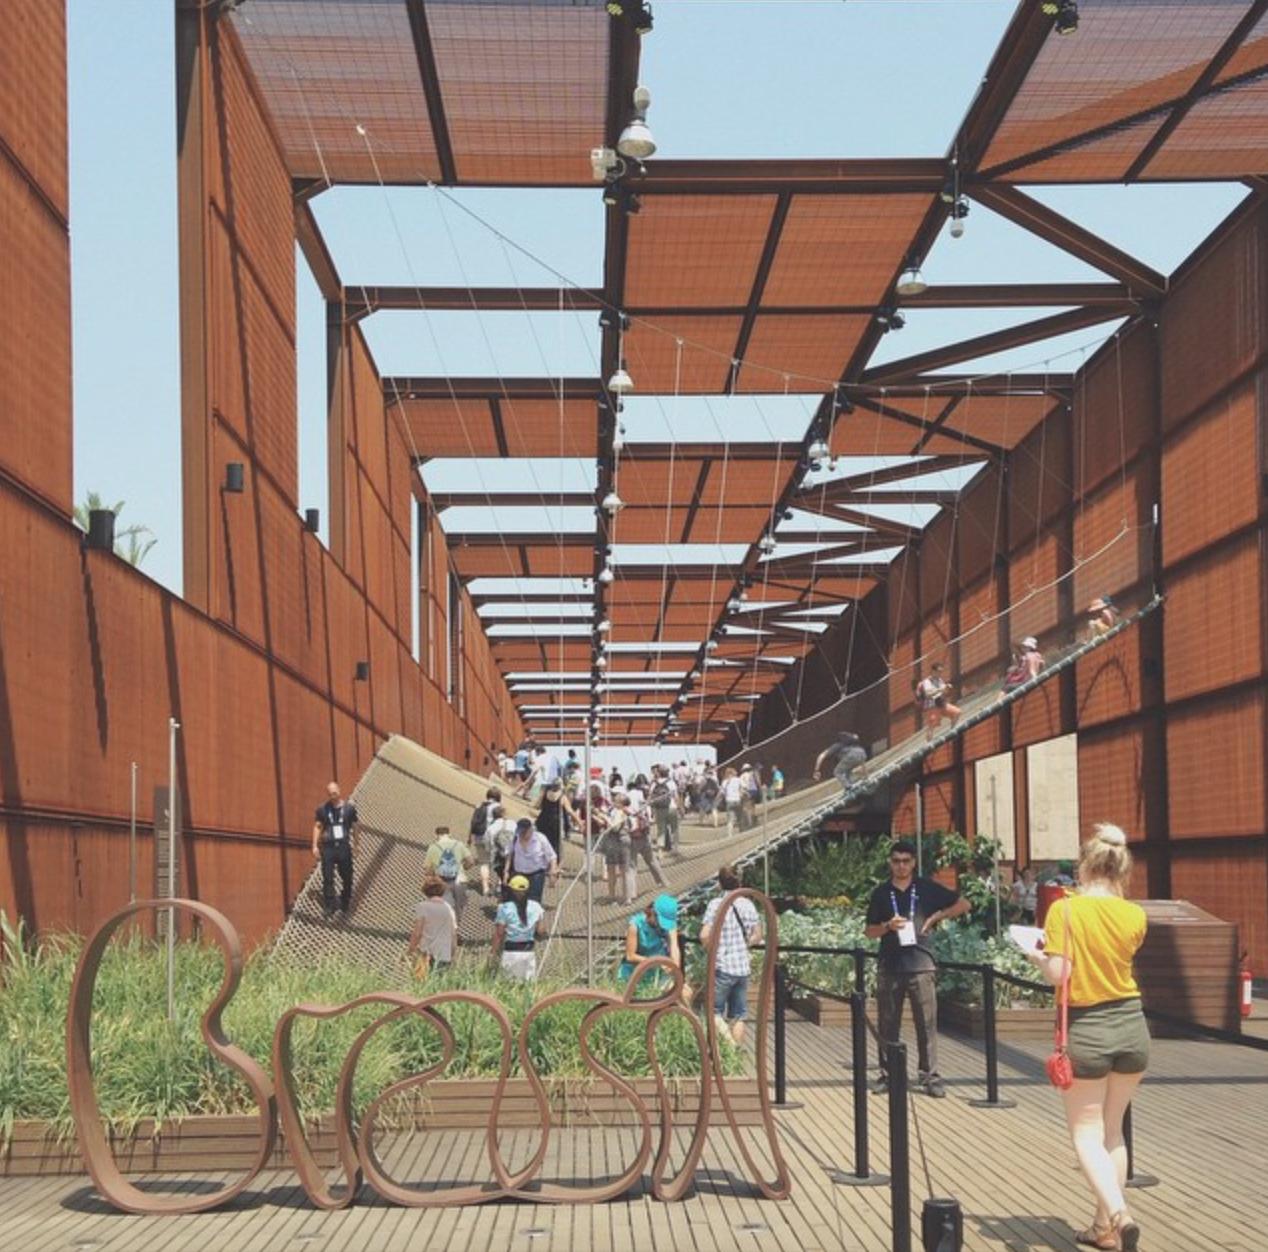 INGRIDESIGN EXPO 2015 MILANO brazilian pavilion